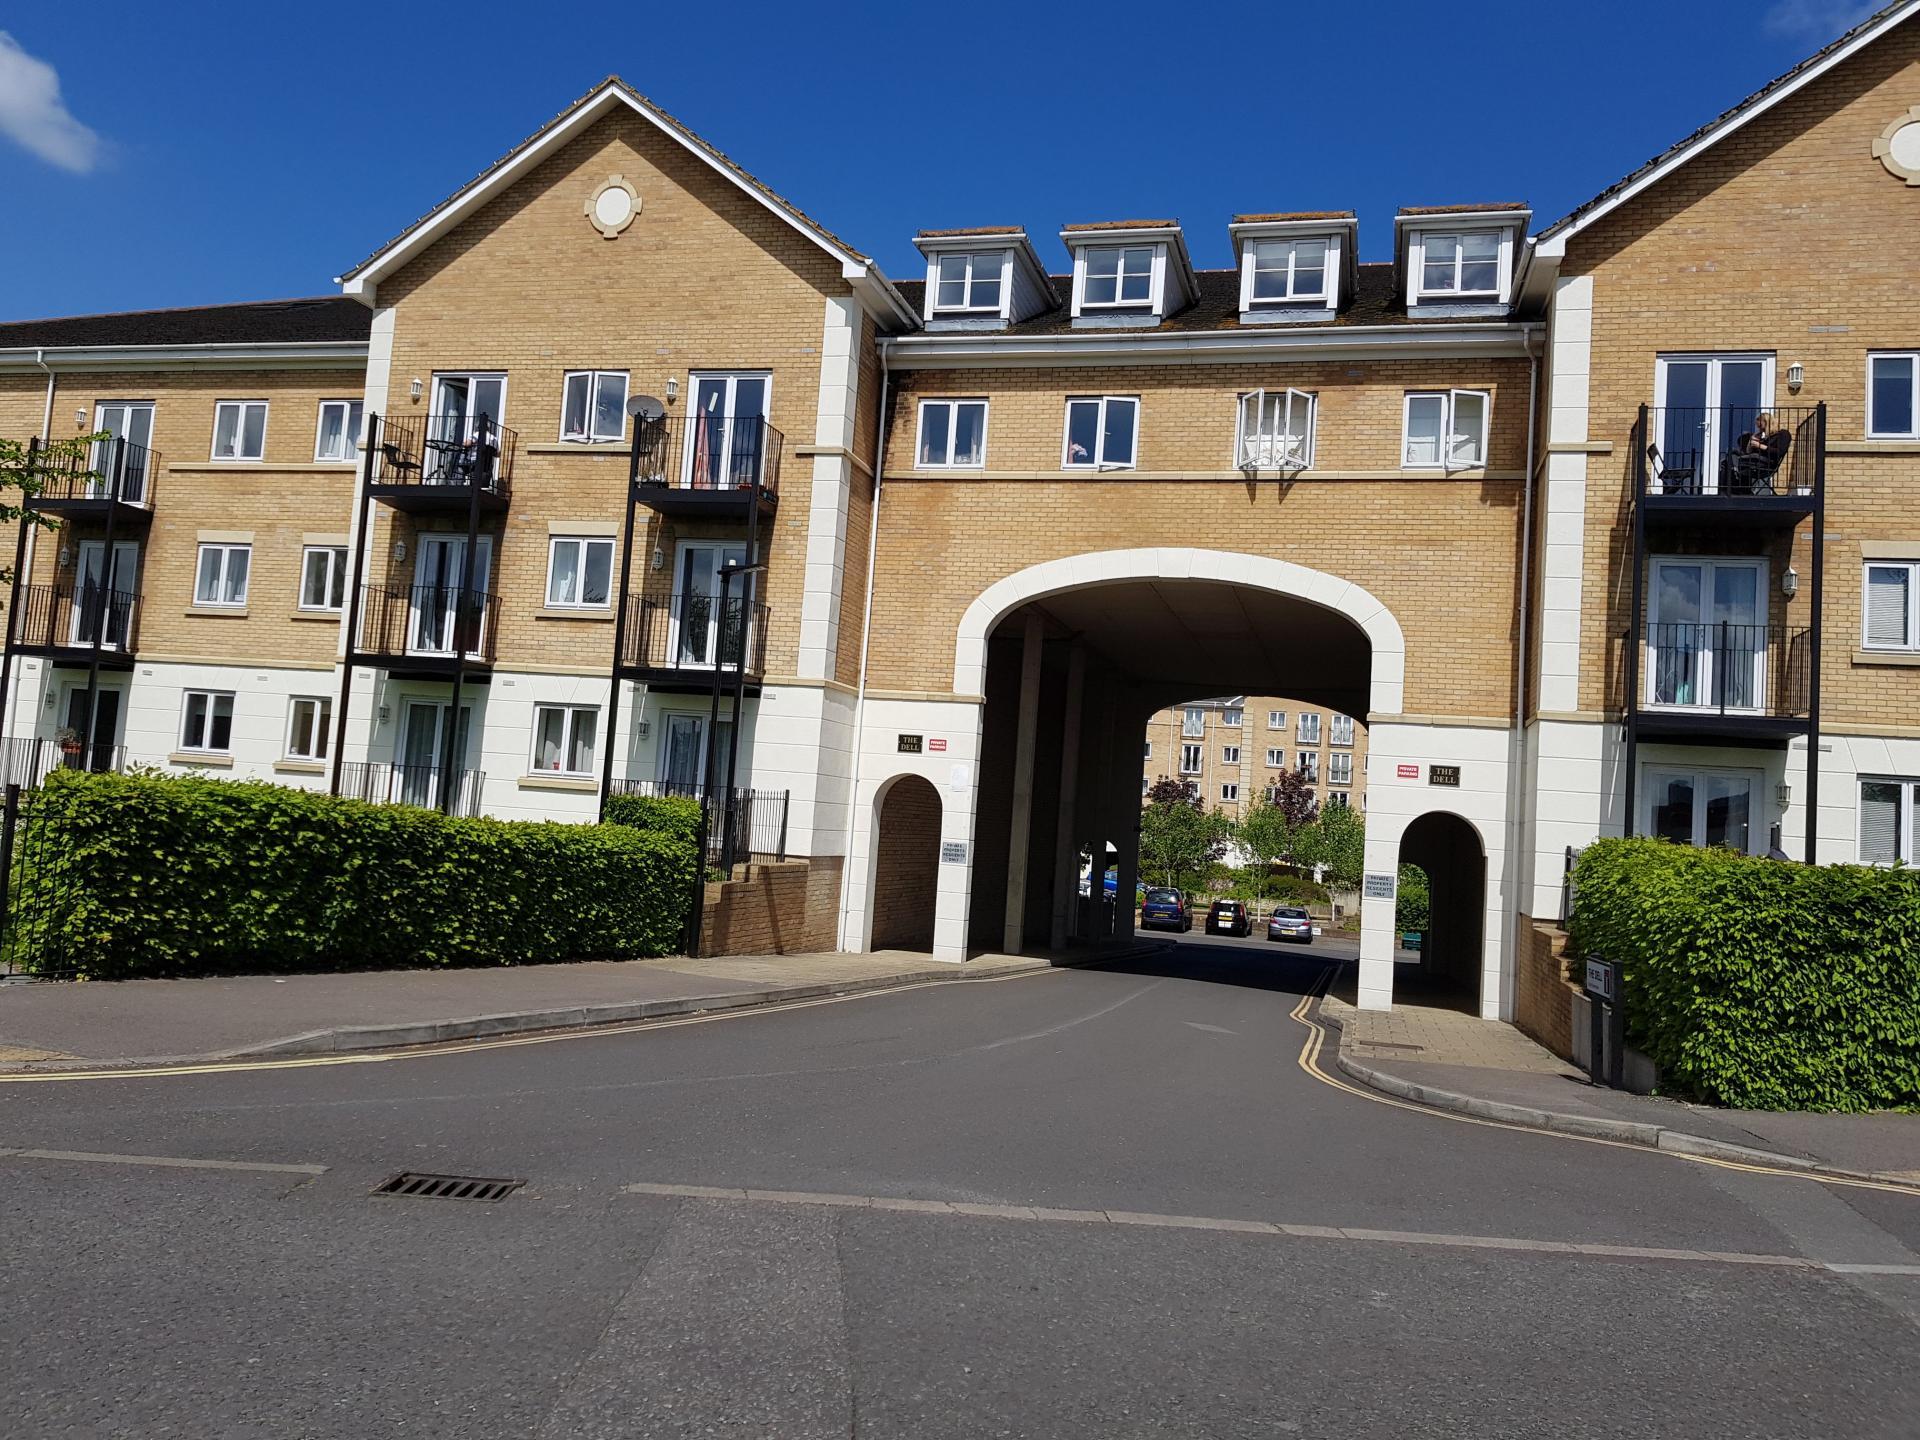 Exterior at Le Tissier Court Apartment, The Polygon, Southampton